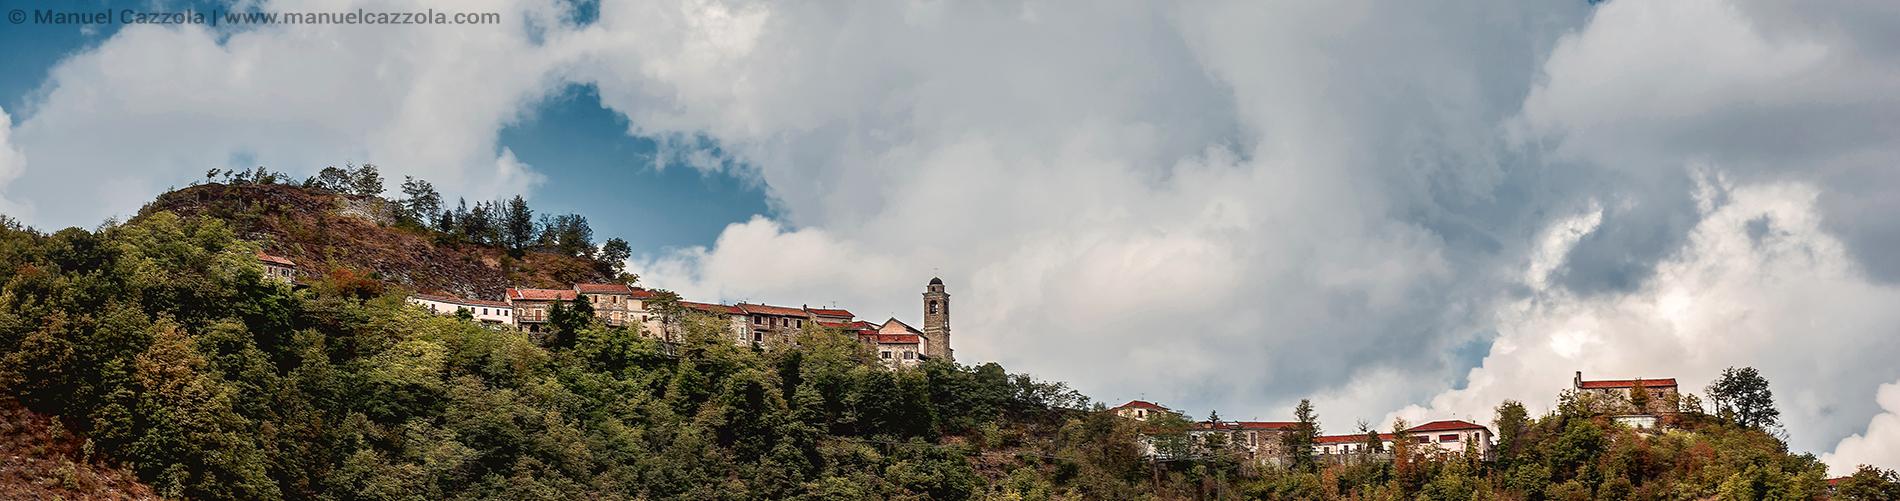 Montechiarodacqui01_Foto_Manuel_Cazzola